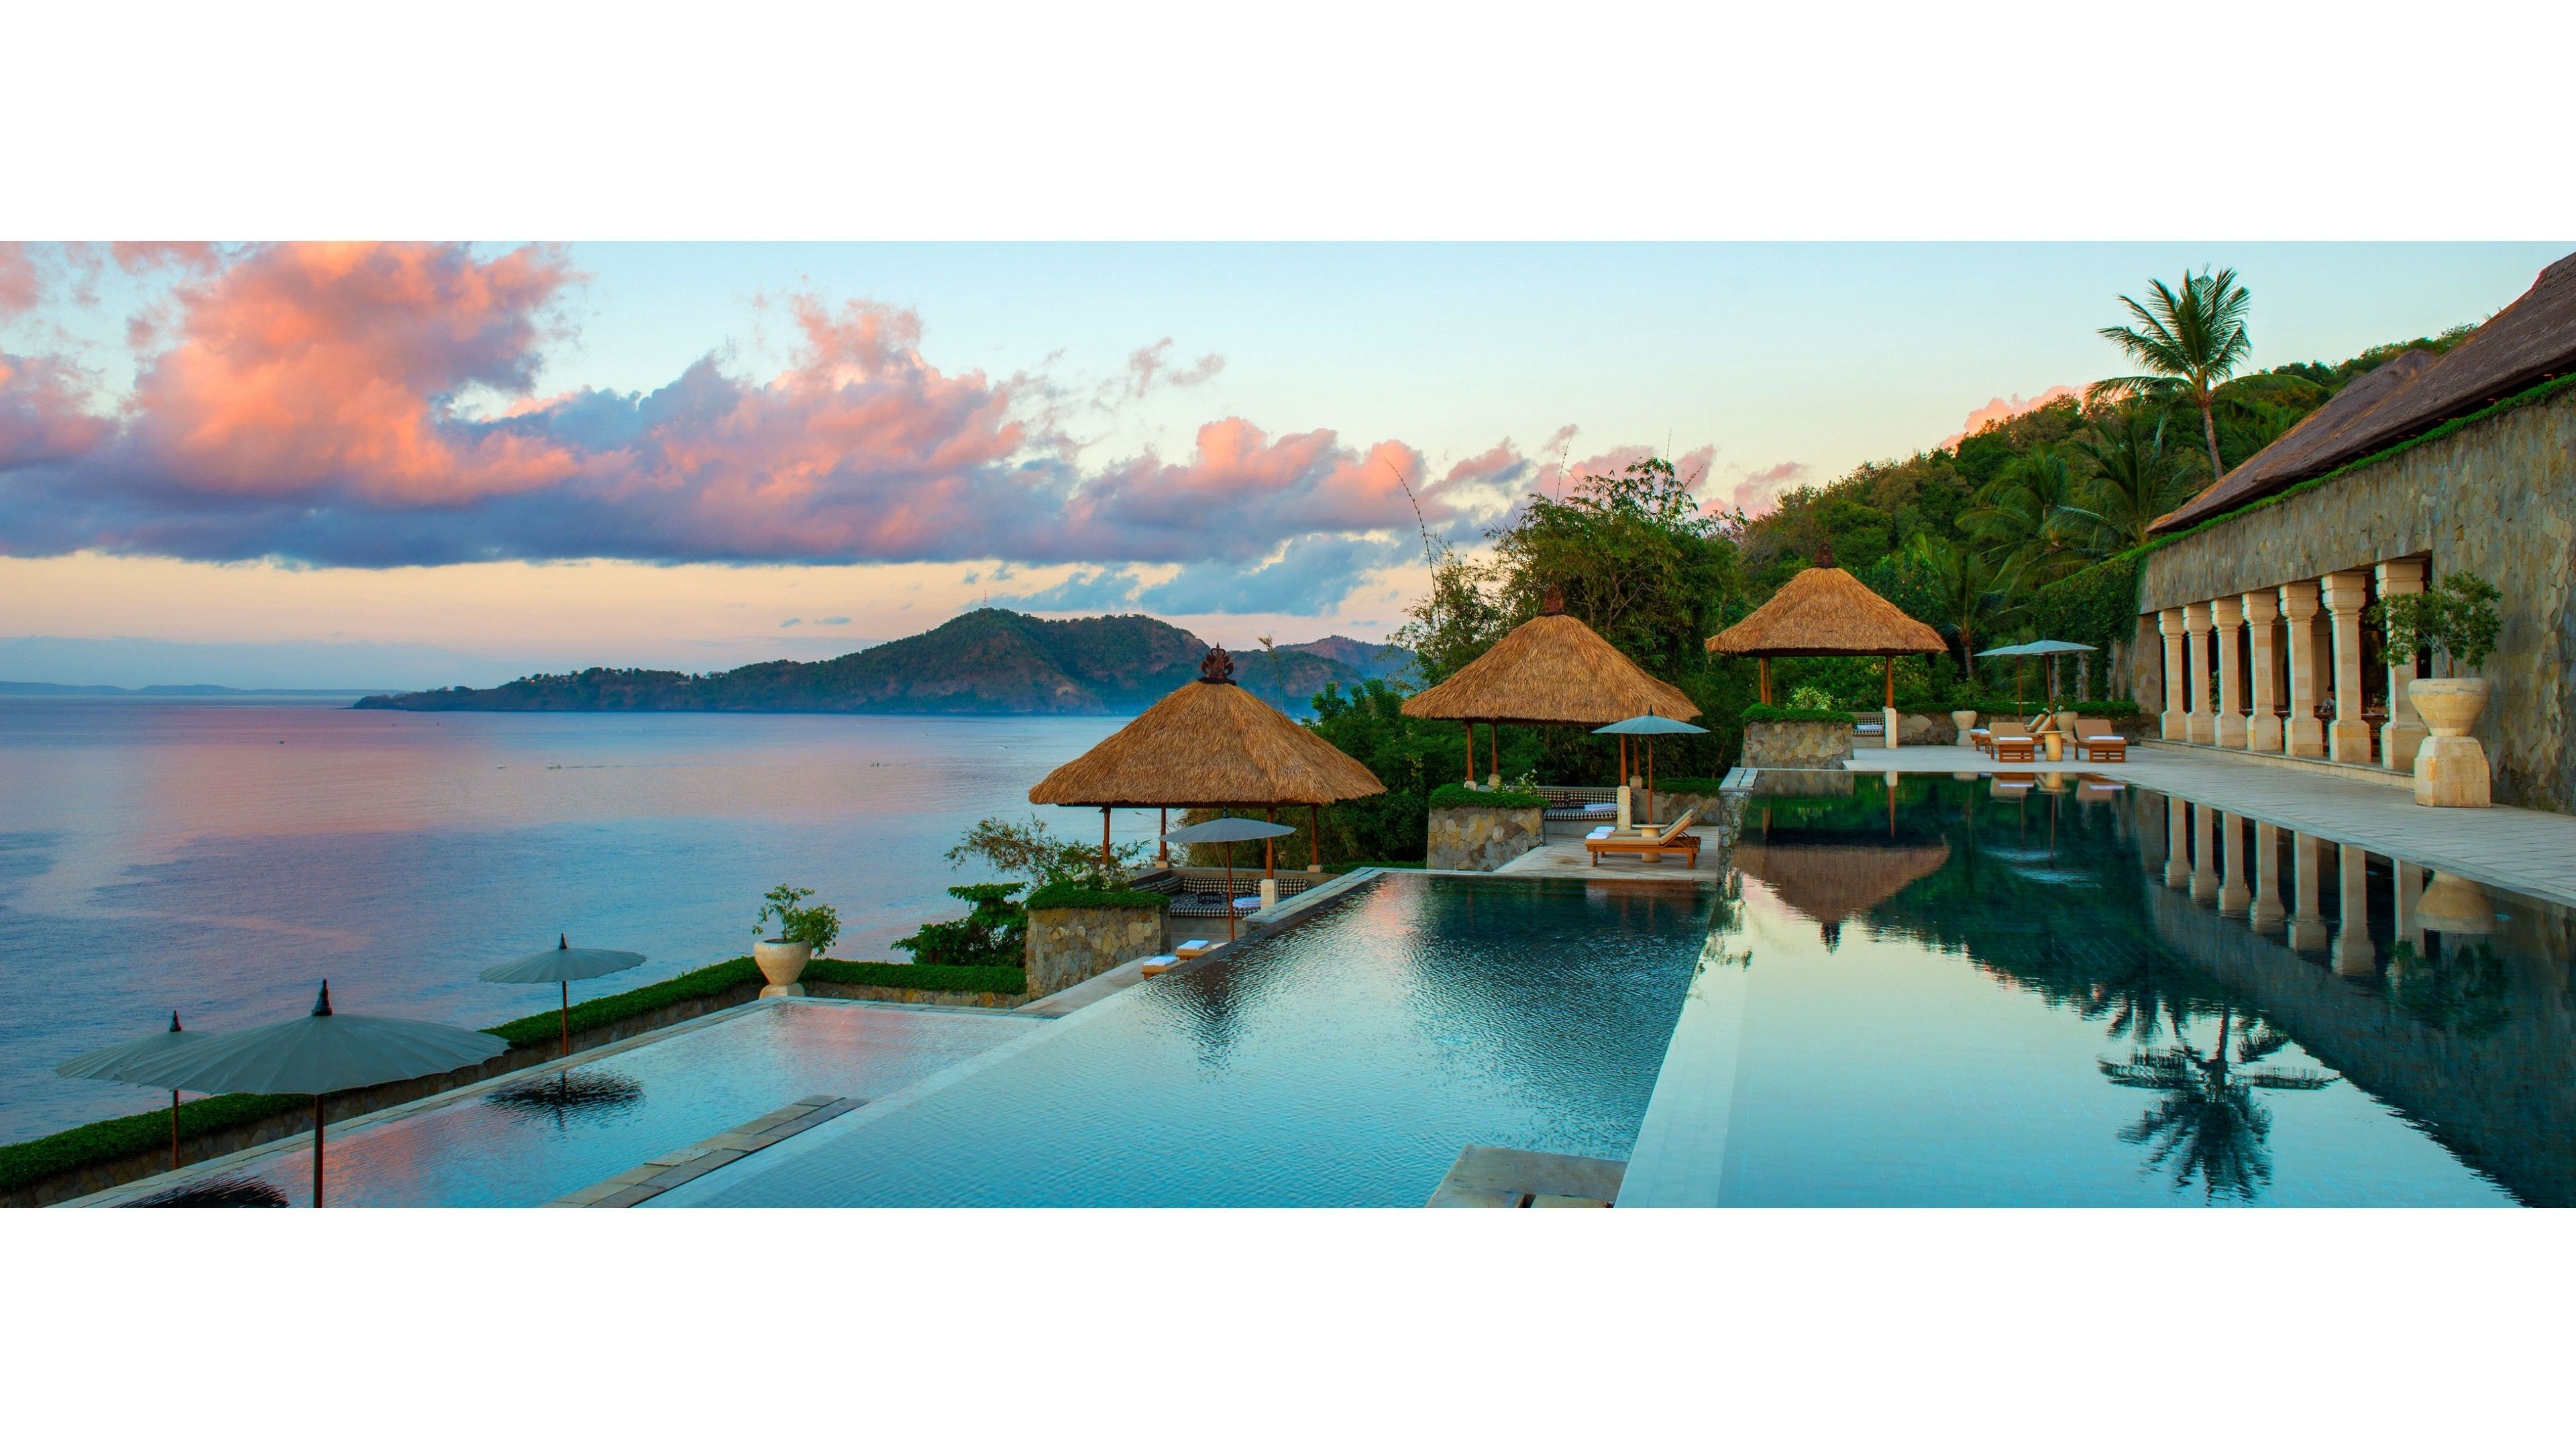 Amankila Bali Indonesia Hotels Resorts Bali Resort Bali